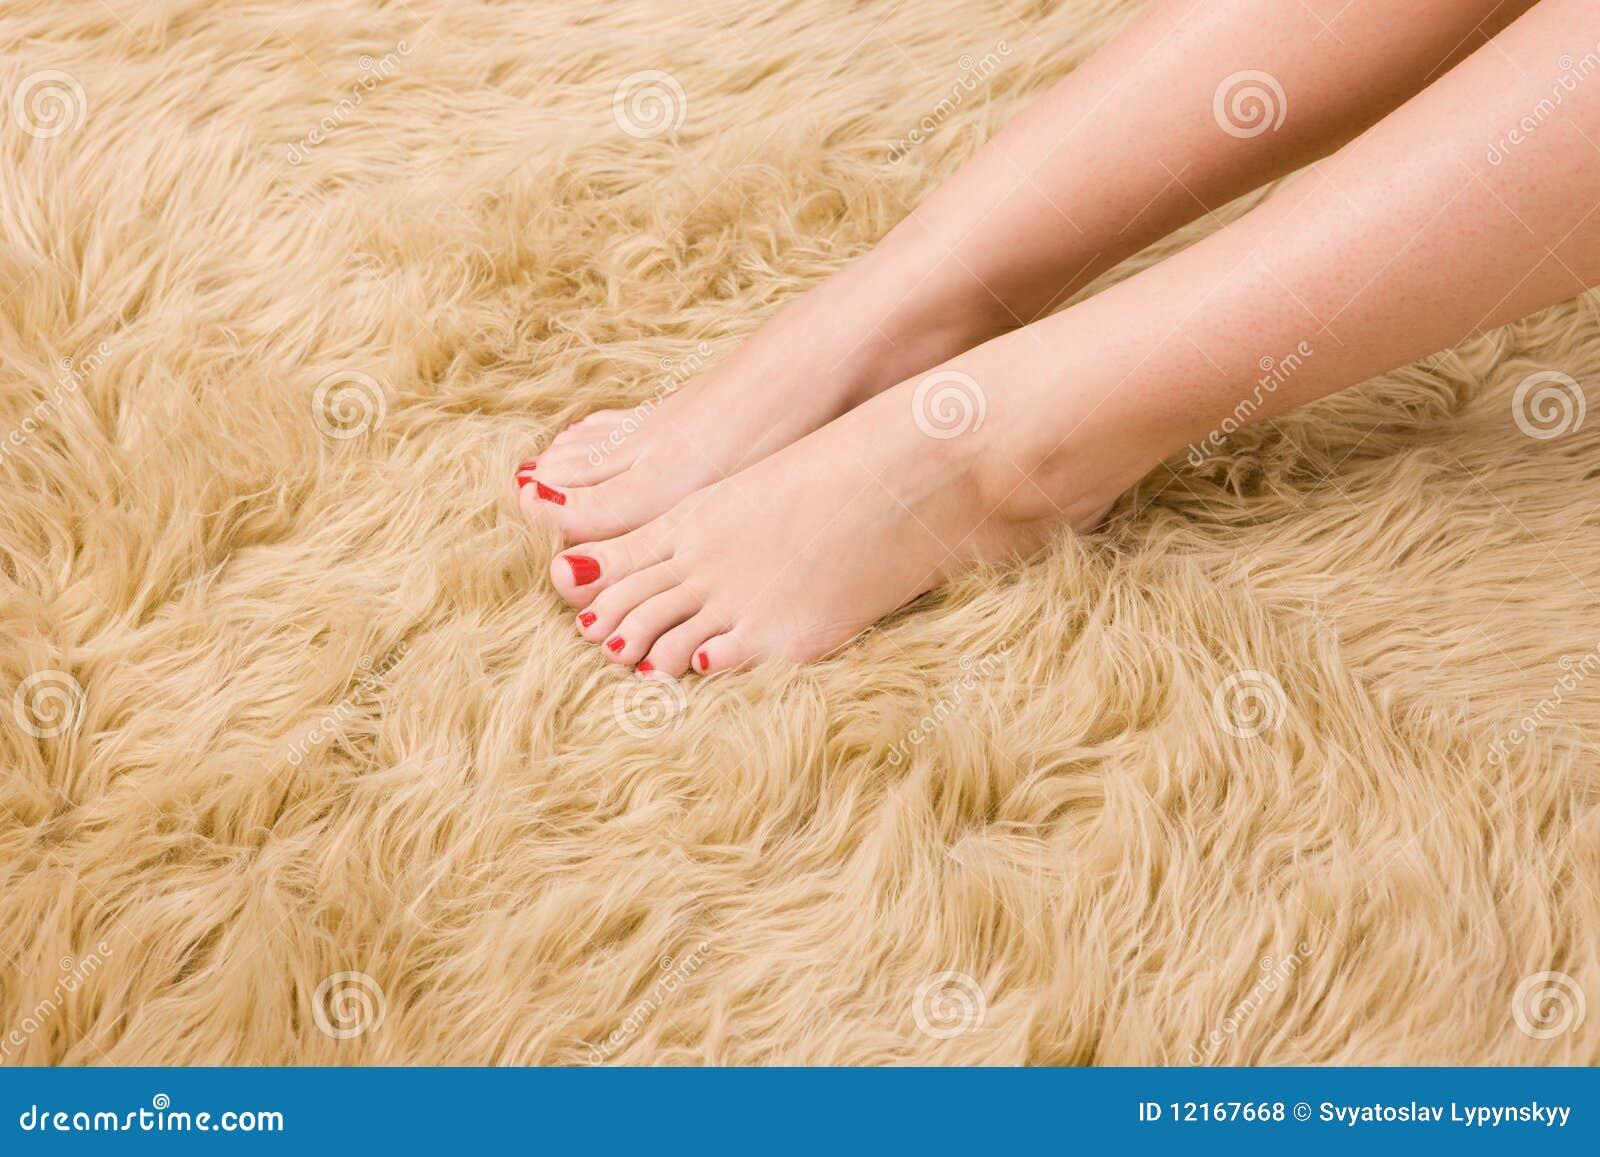 Beautiful Female Feet On Wool Carpet Royalty Free Stock Photos - Image ...